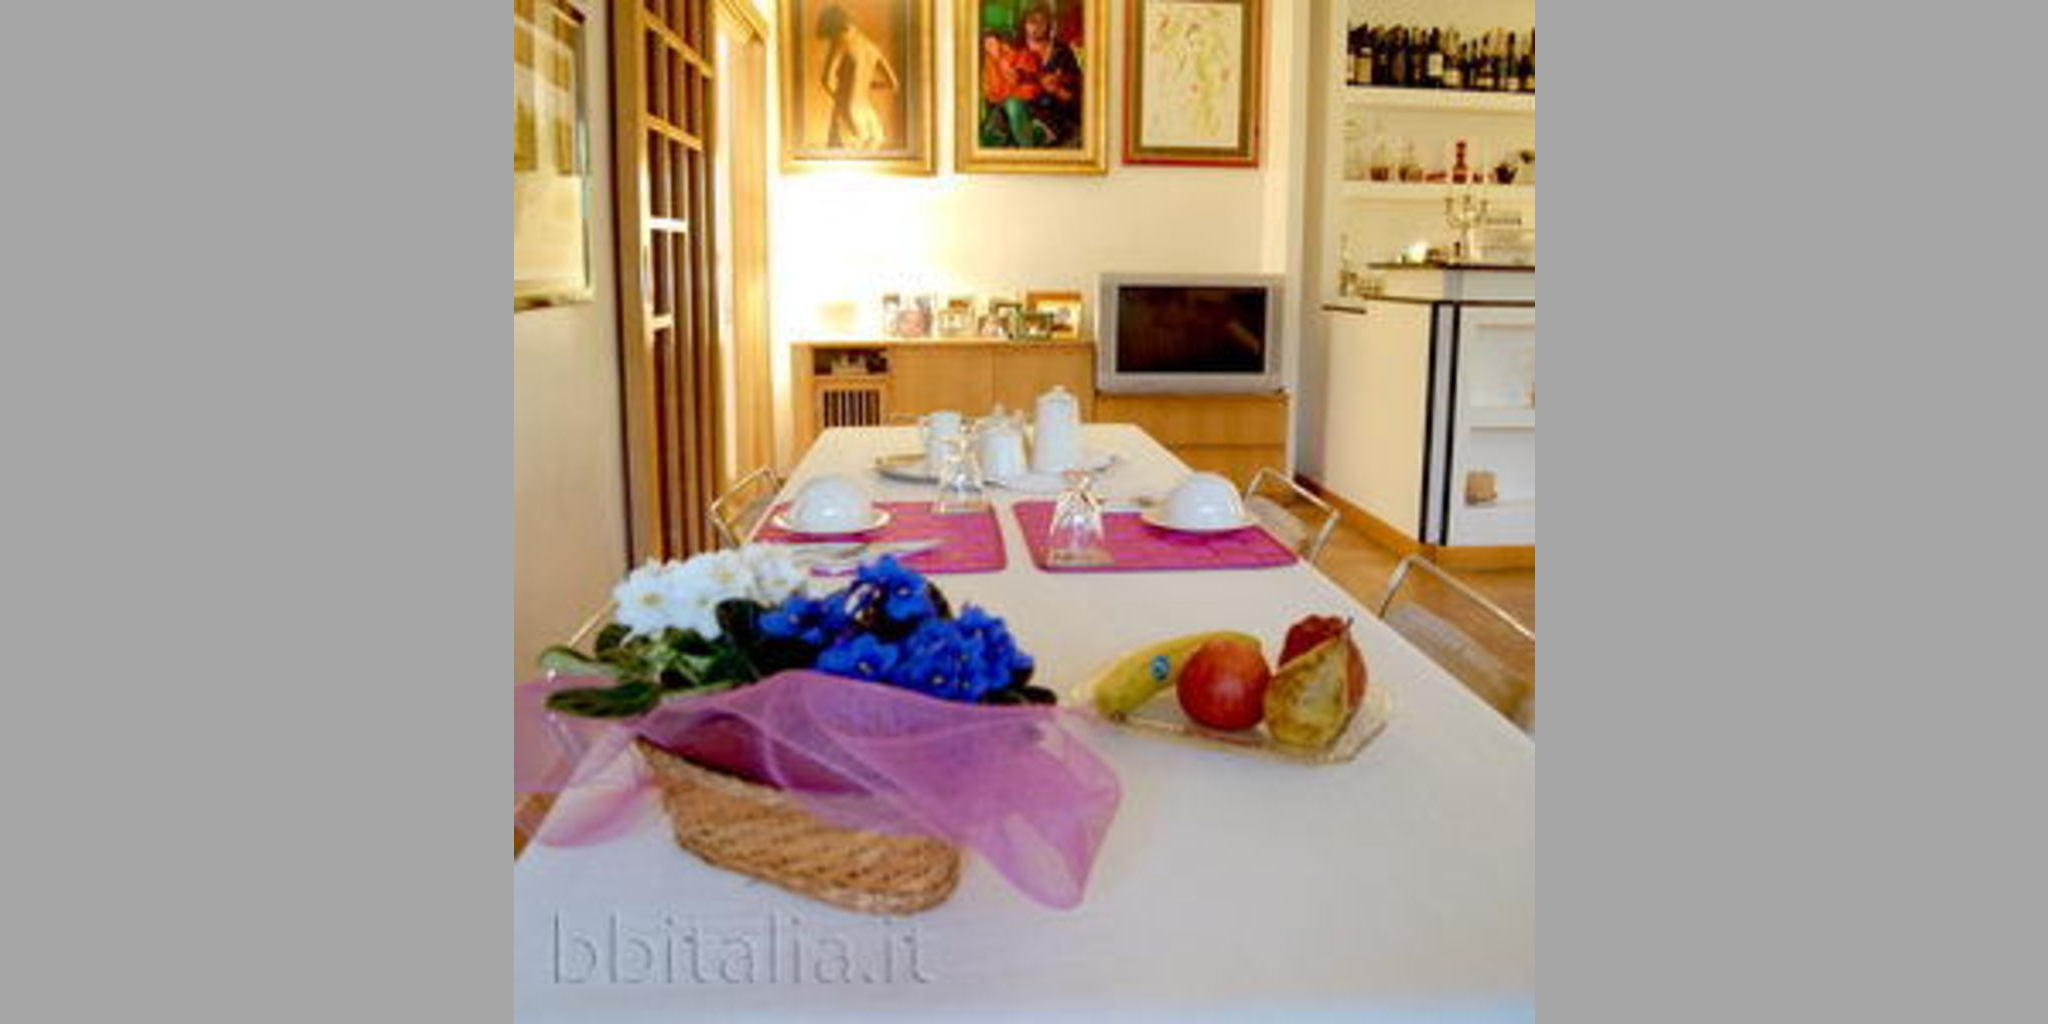 Bed & Breakfast Roma - Villa Bonelli  Enrico Albanese